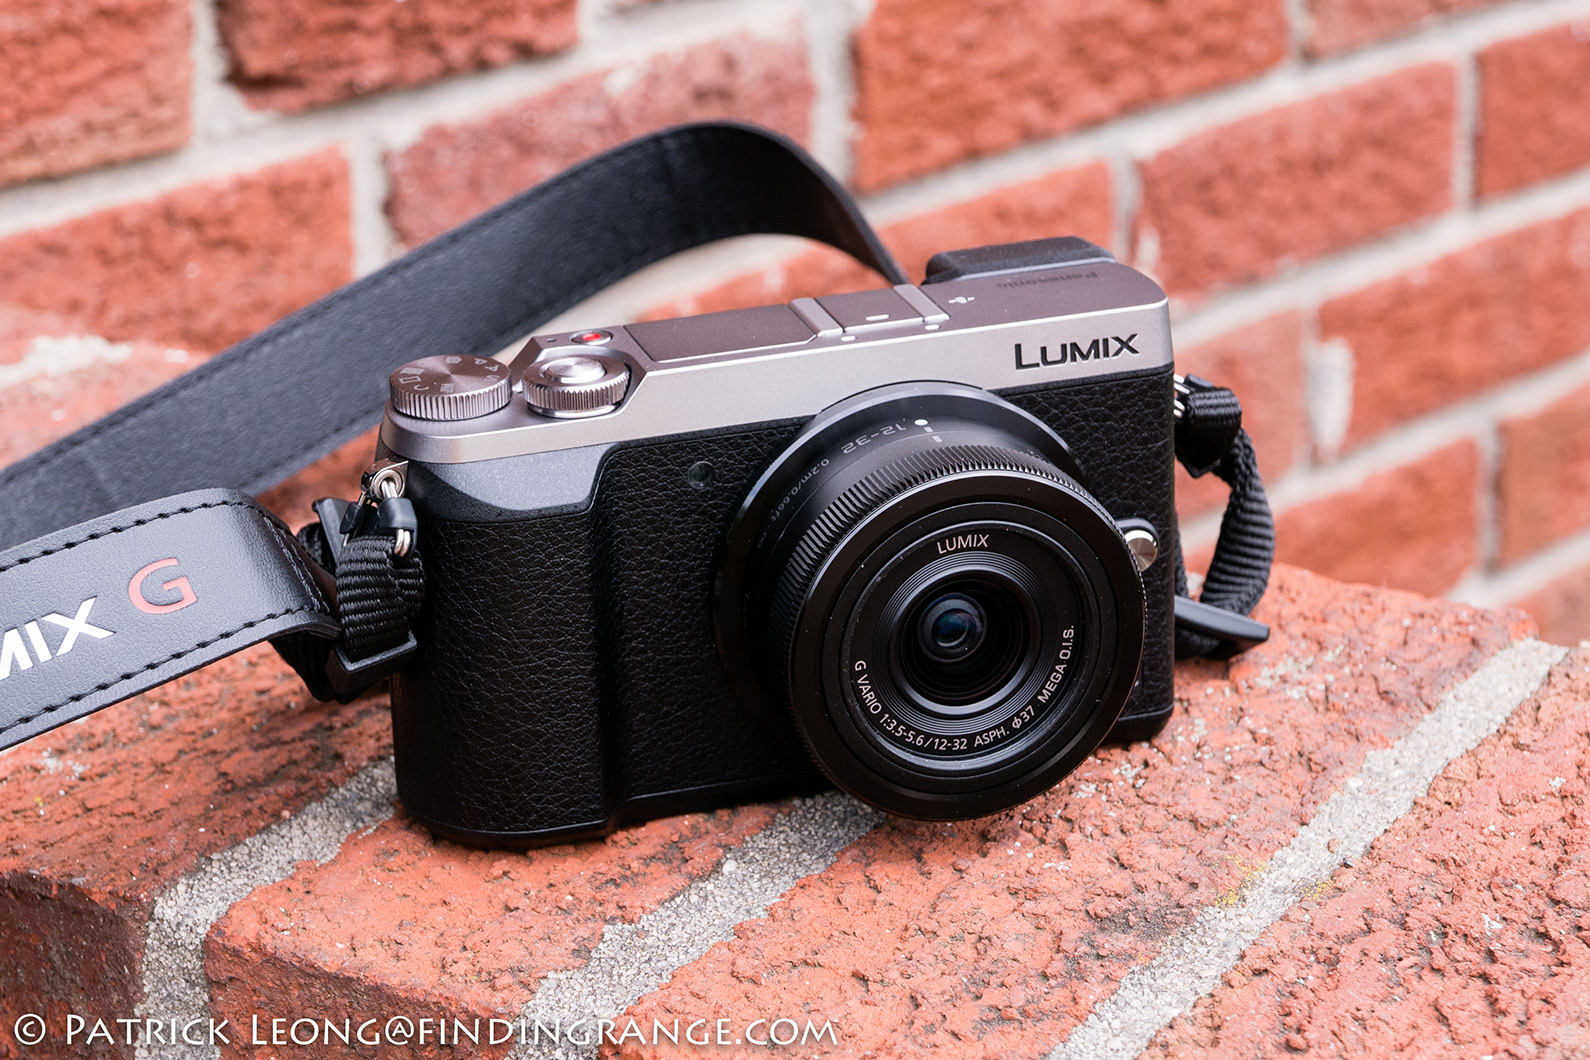 Panasonic-Lumix-GX85-Lumix-G-Vario-12-32mm-f3.5-5.6-ASPH-First-Impressions-2